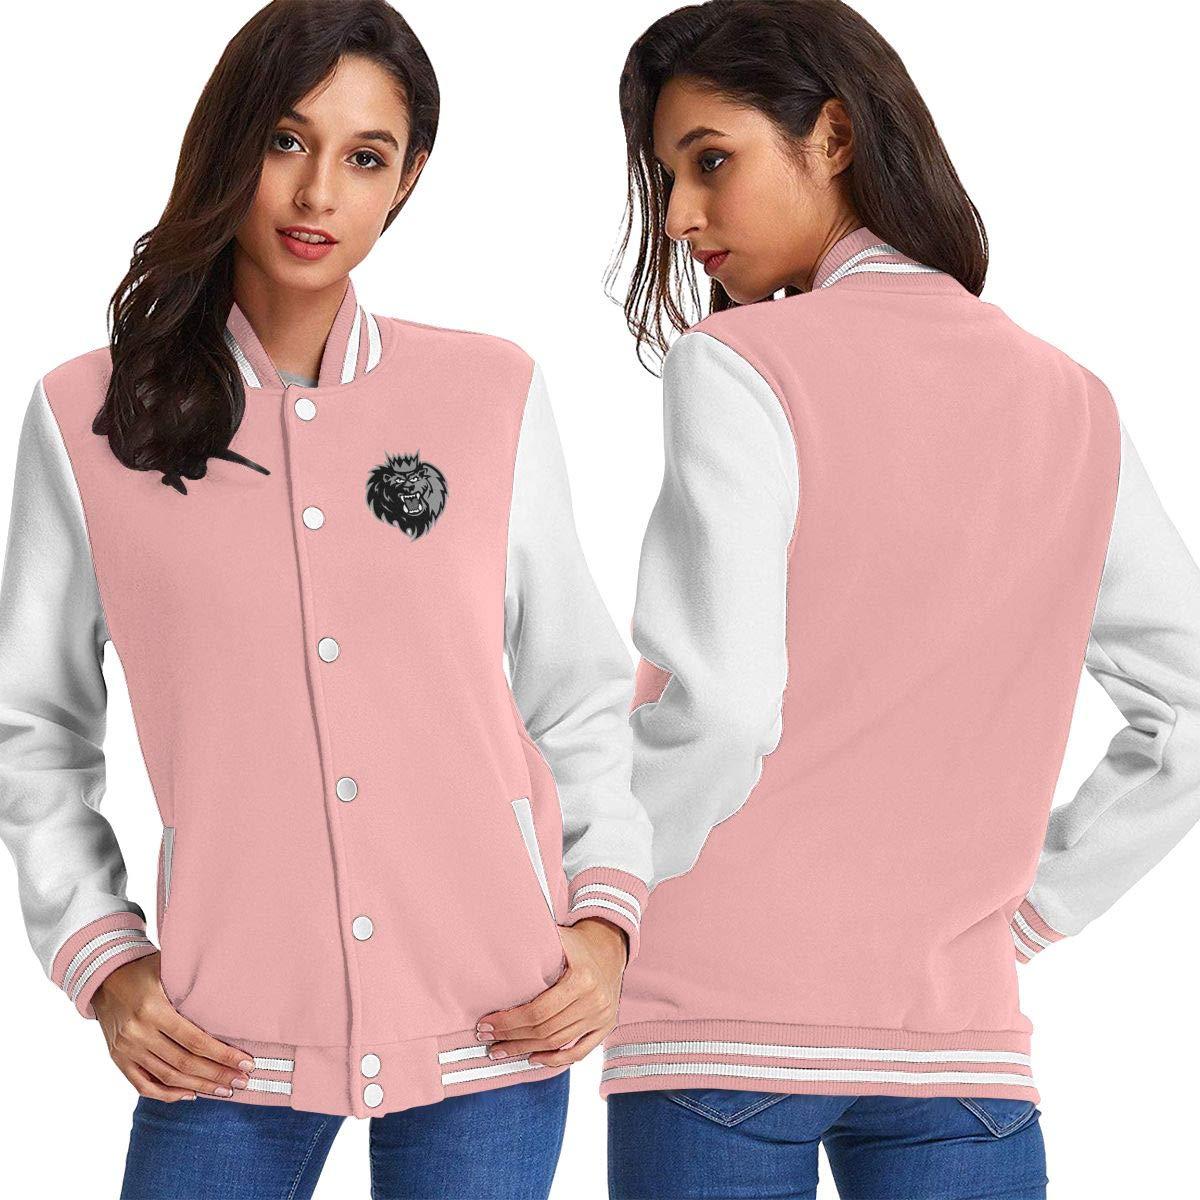 Pink Women Basketballsadw HockeyManchesterMonarchsLogo Baseball Uniform Jacket